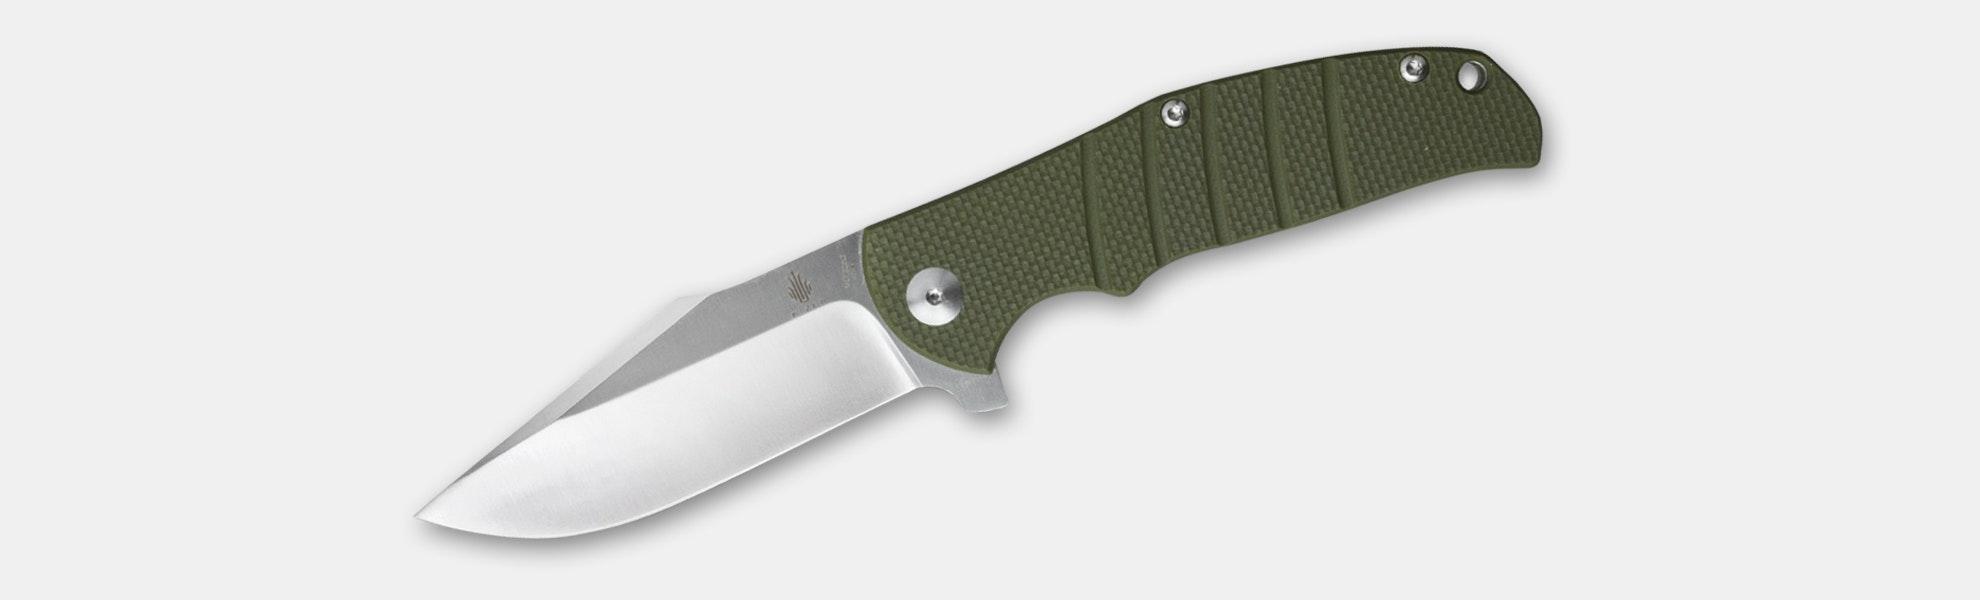 Kizer V4468A2 Laconico Intrepid Flipper Knife